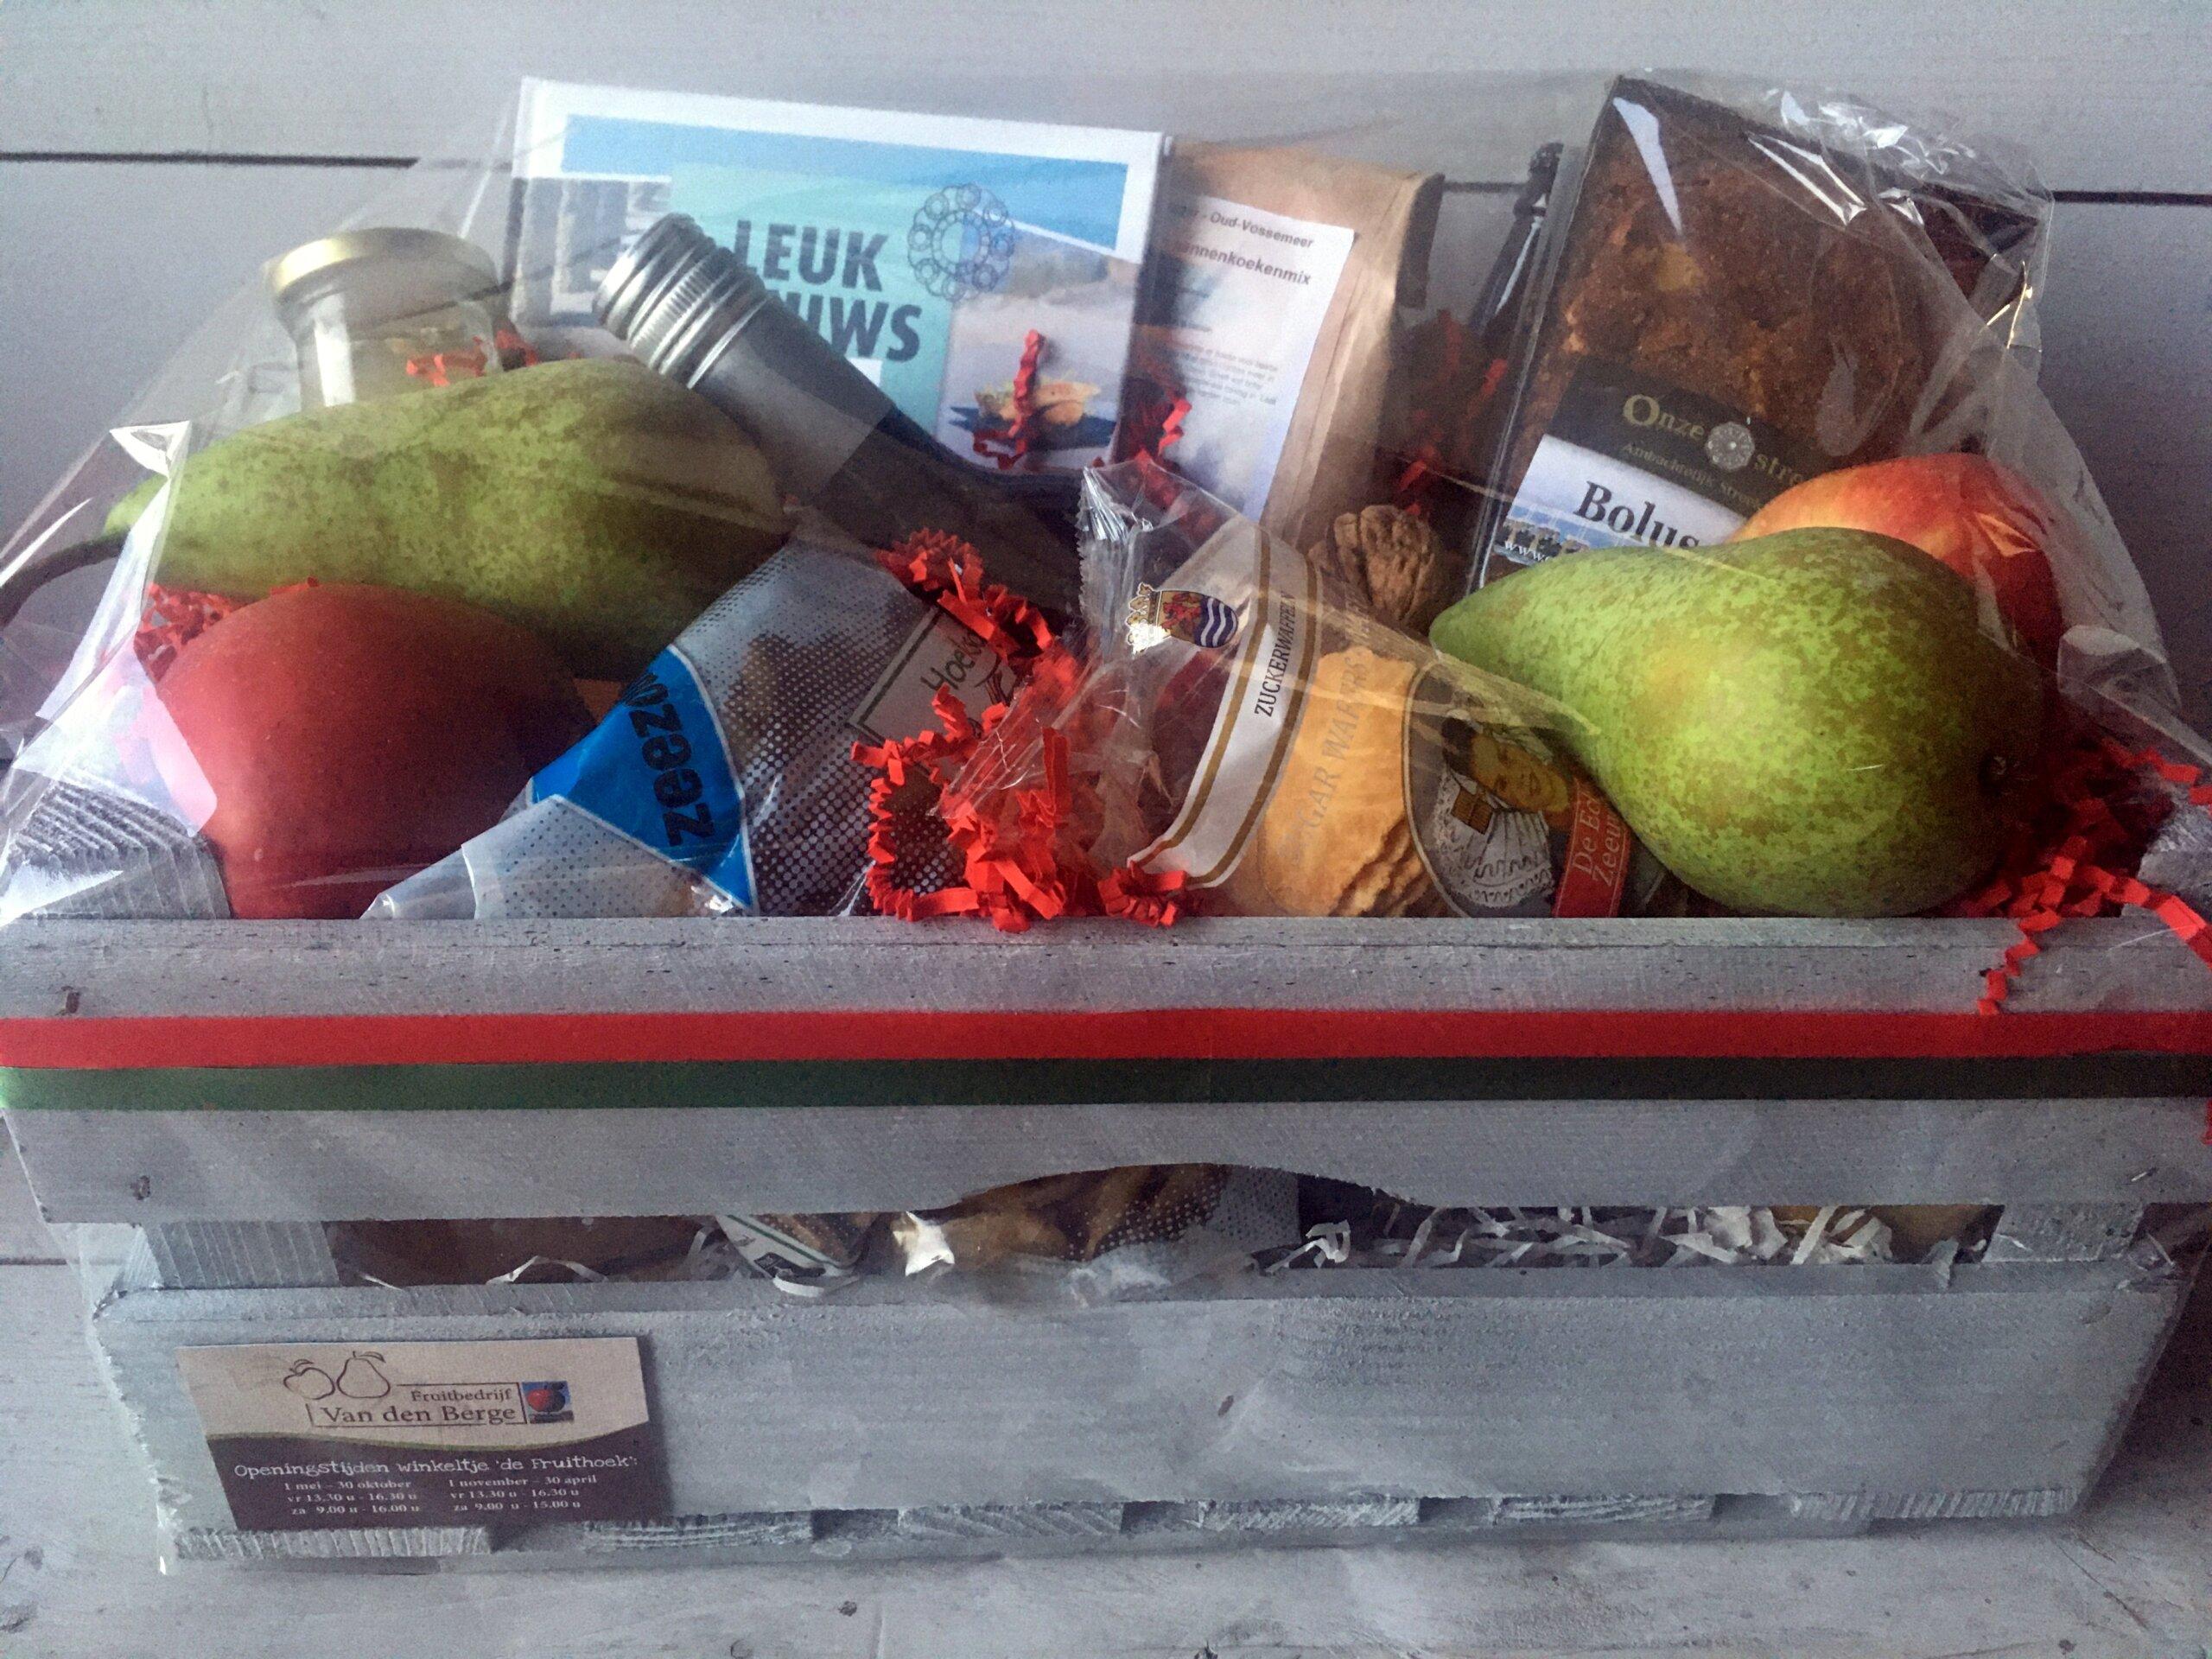 Fruitbedrijf Van den Berge pakket 5 jarig jubileum